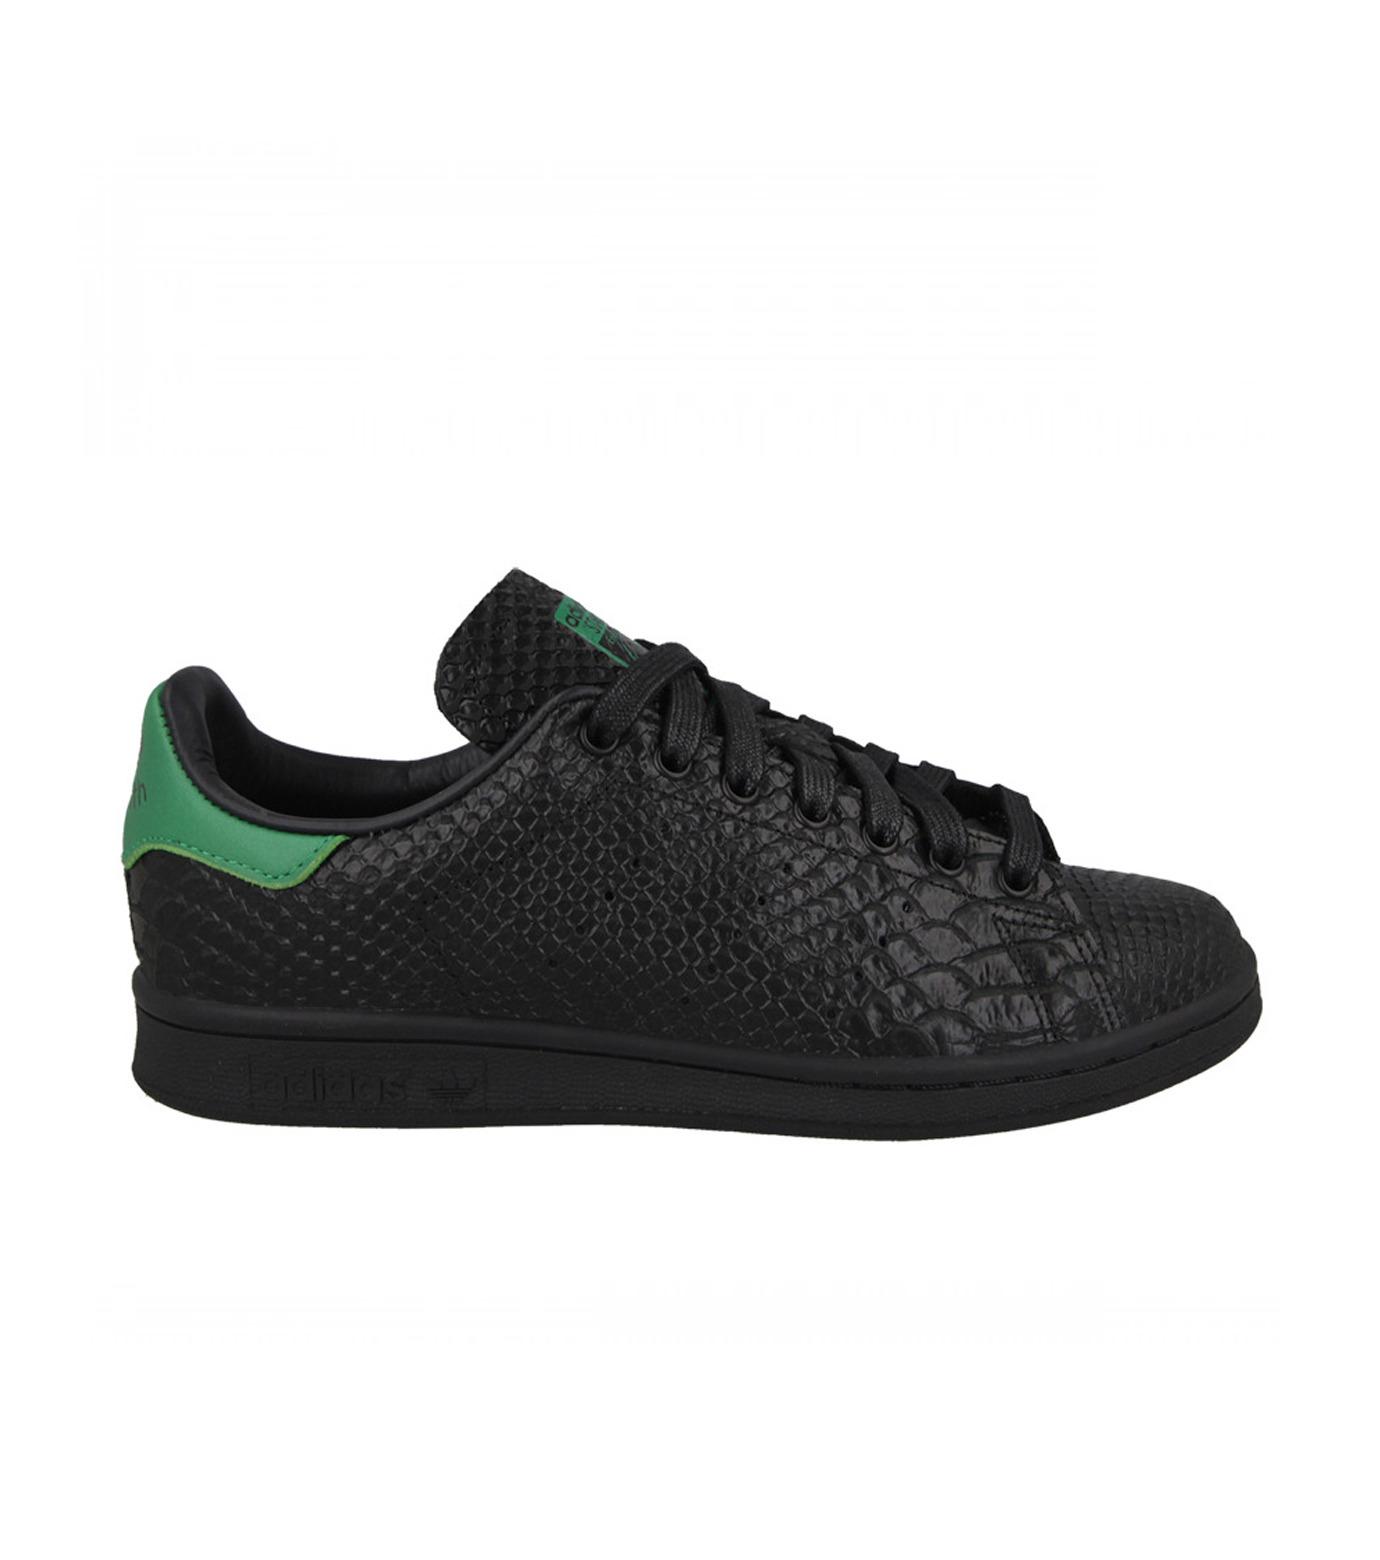 adidas(アディダス)のSUPERSTAR 80s-BLACK(シューズ/shoes)-S80022-13 拡大詳細画像1